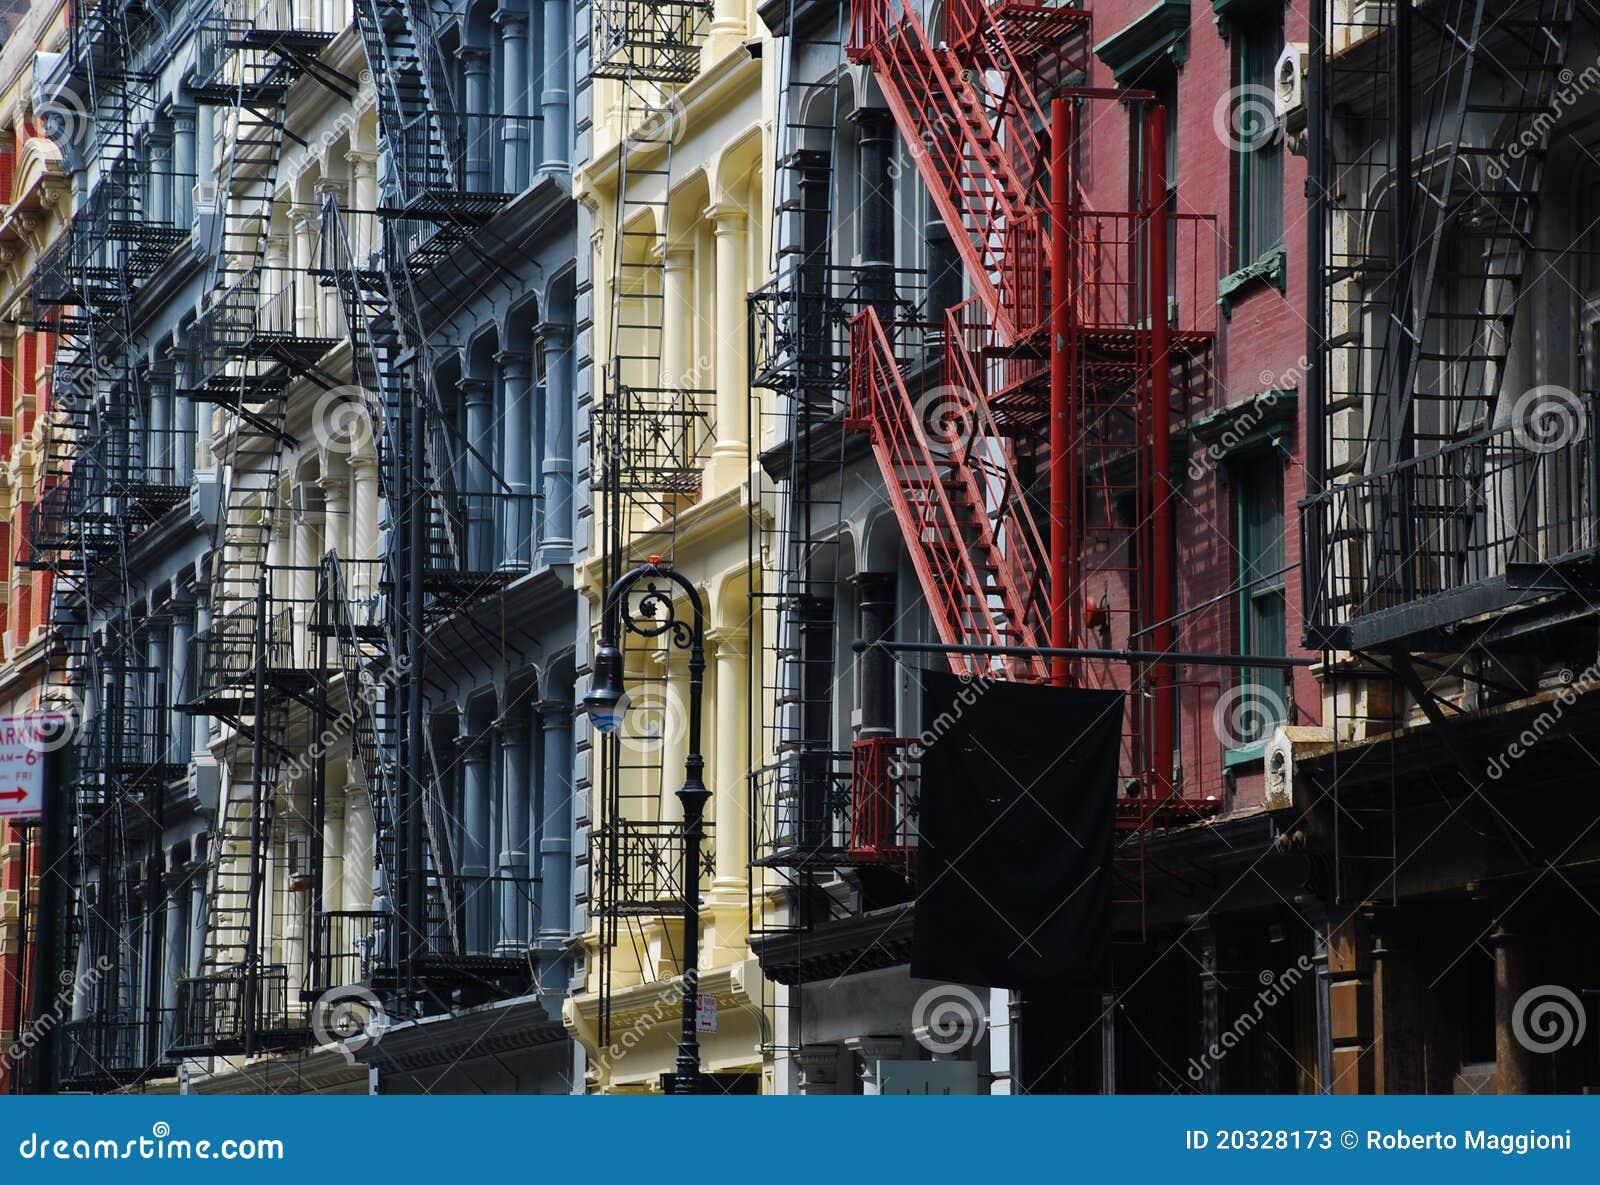 Soho new york architettura del ghisa immagine stock for New york architettura